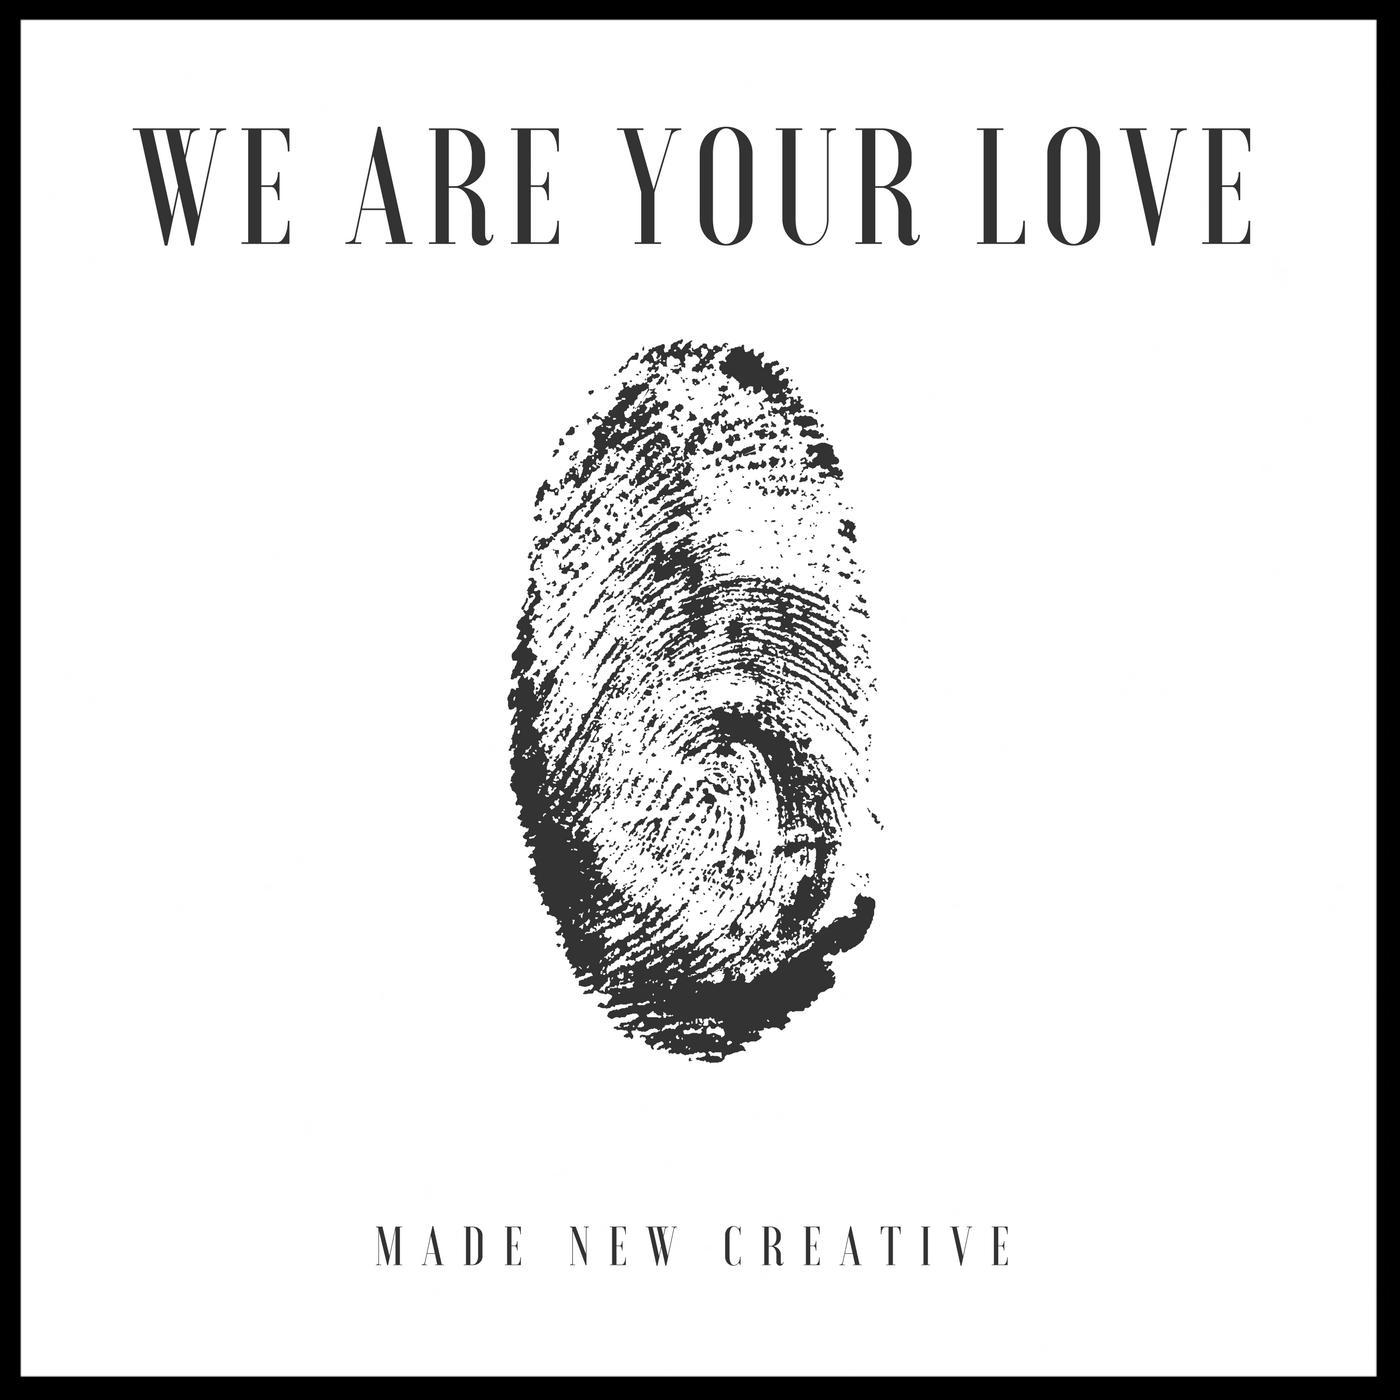 INVERTED_WE  ARE YOUR LOVE_ALBUM ART_FINGERPRINT.png